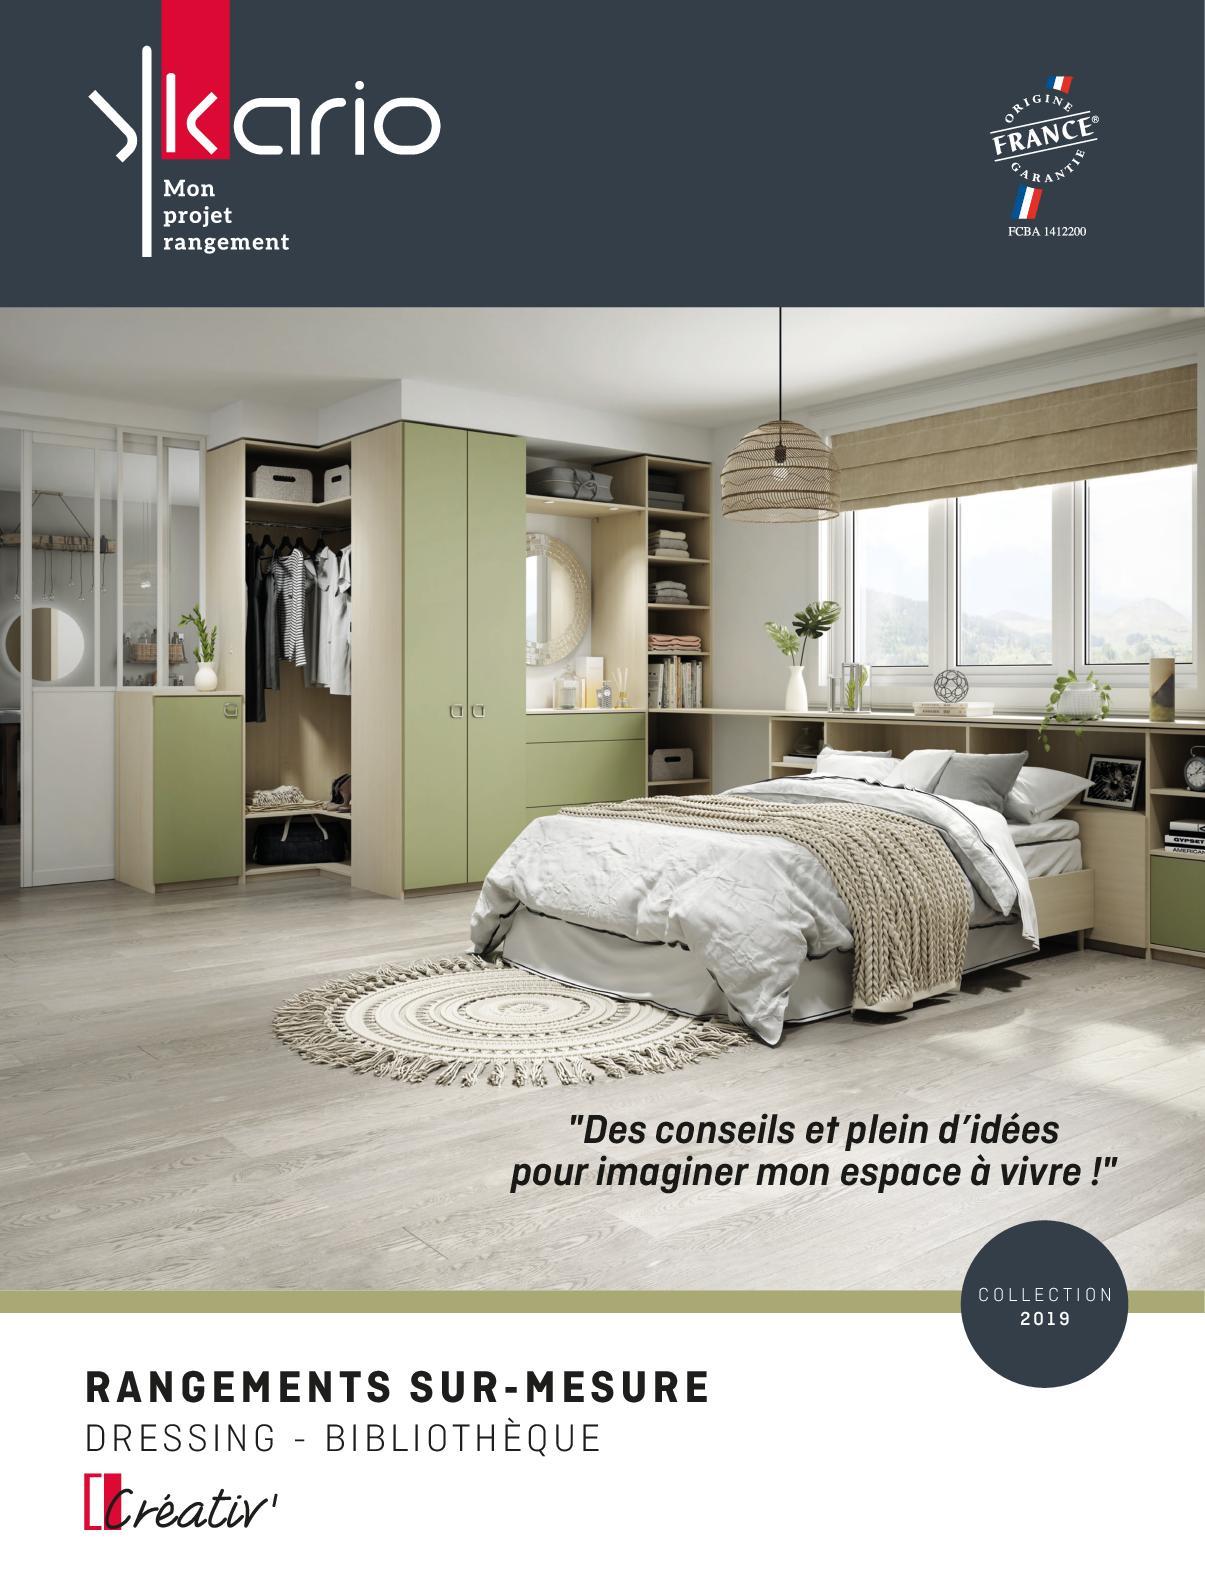 Coût Bibliothèque Sur Mesure calaméo - catalogue ykario dressing 2019